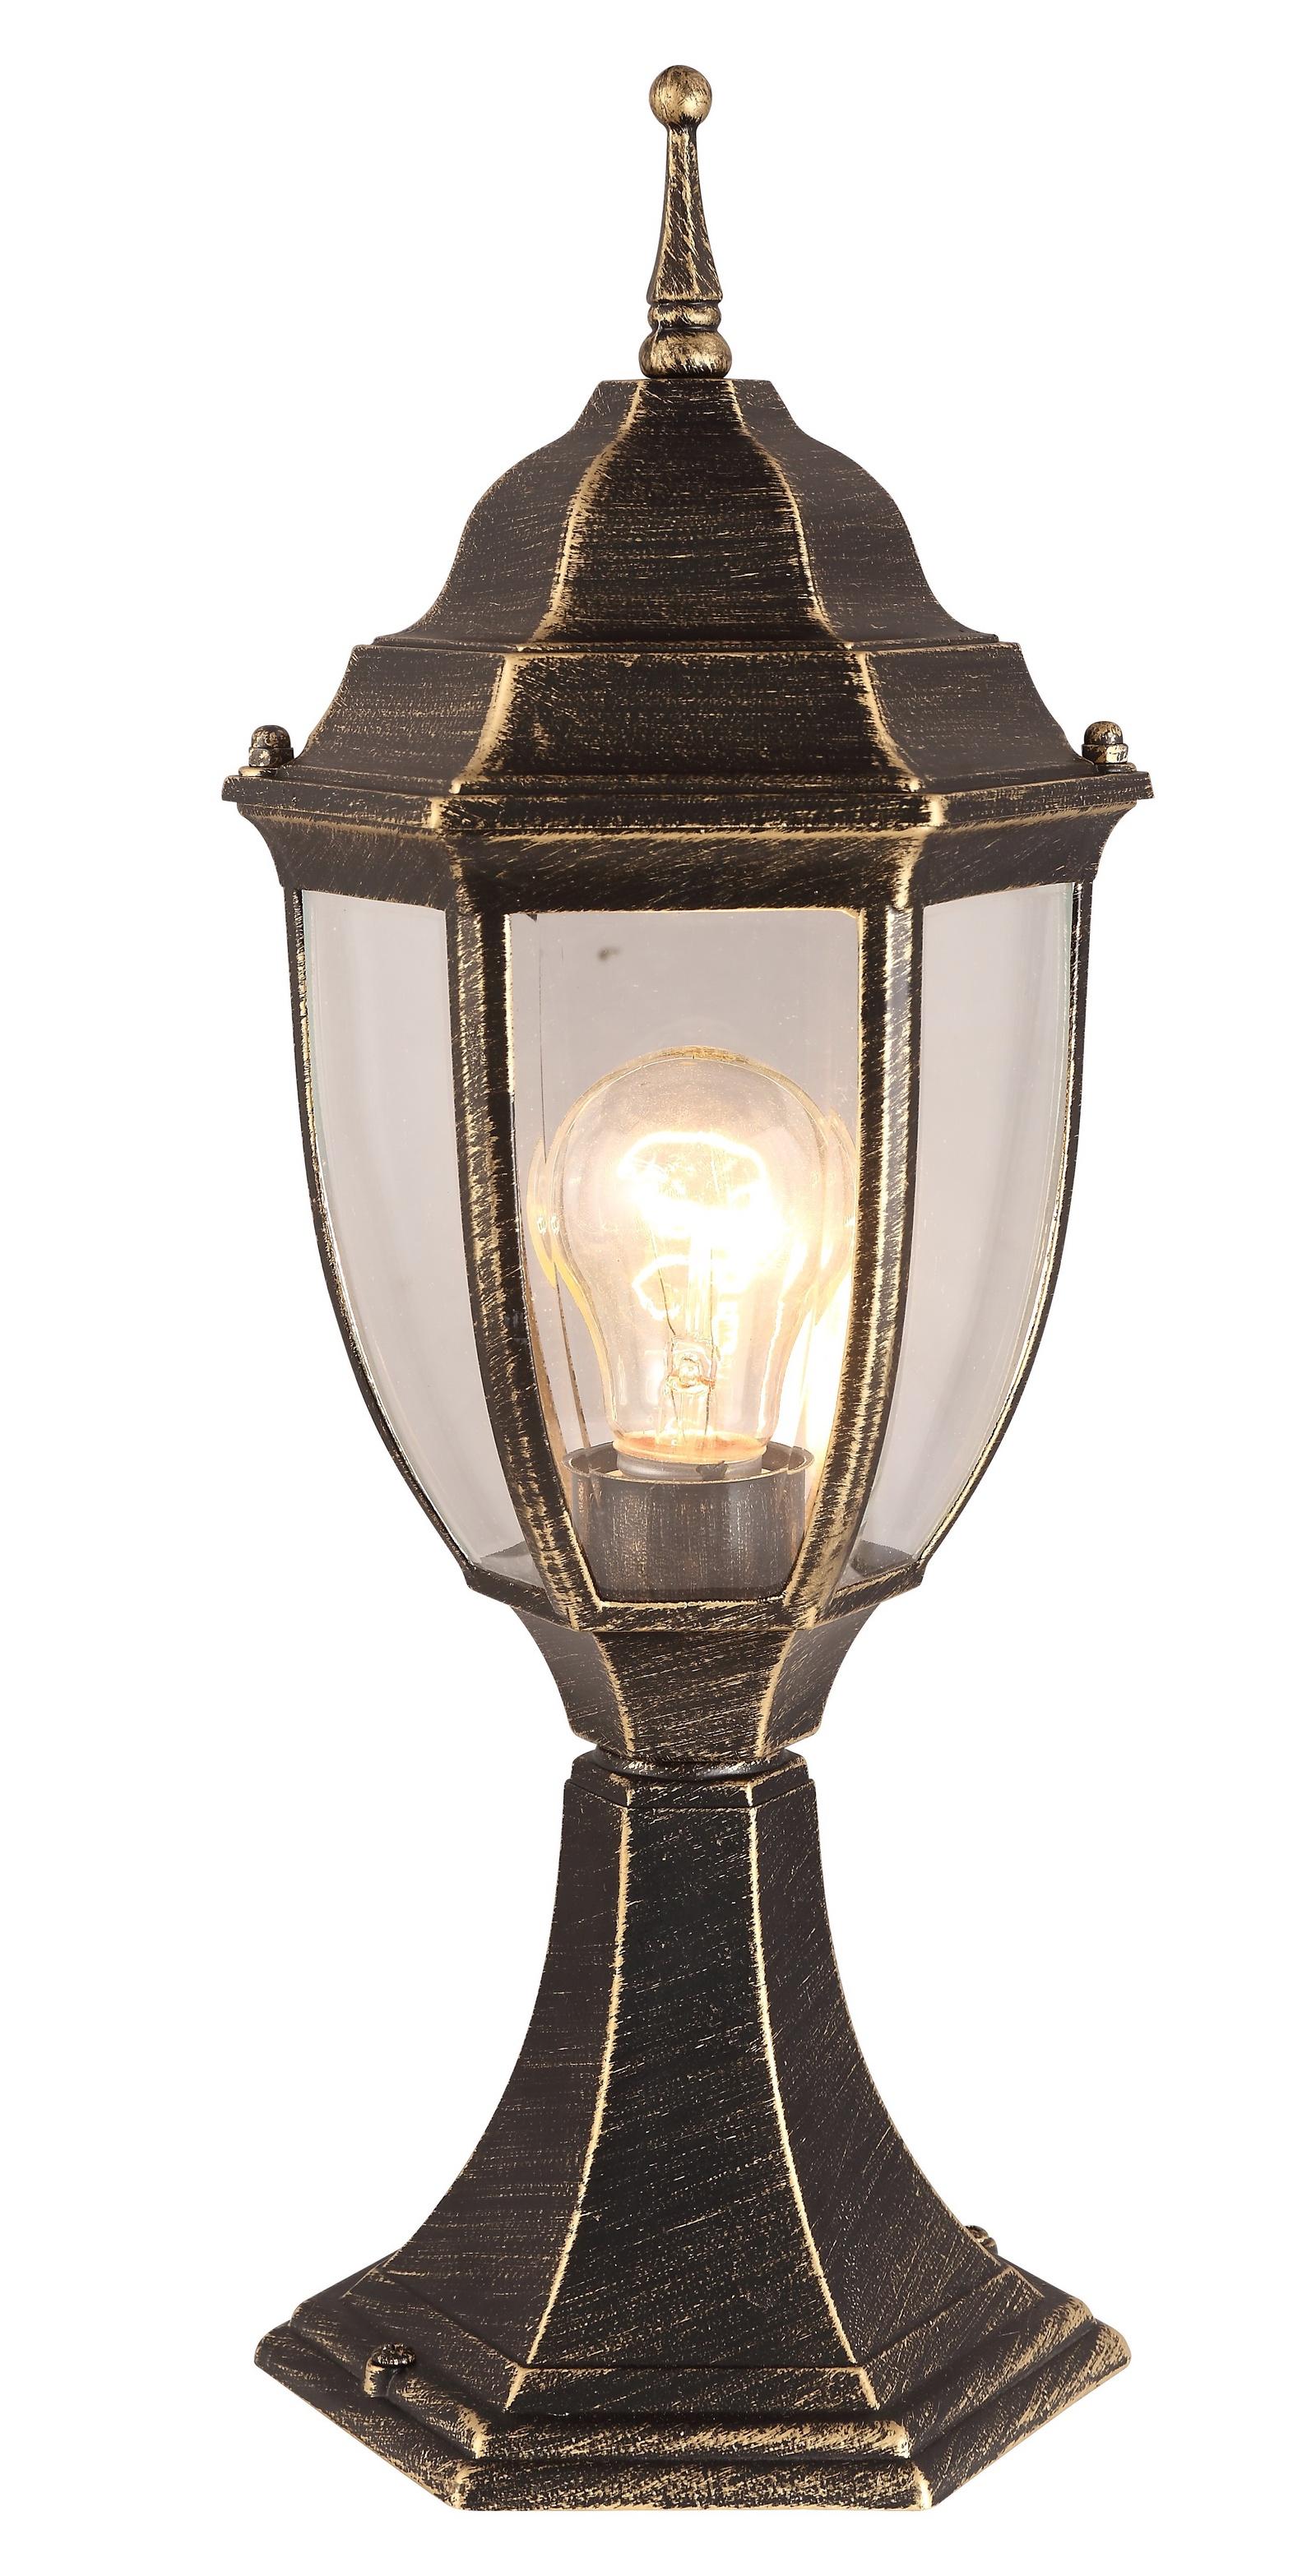 Светильник уличный Arte Lamp Pegasus. A3151FN-1BN уличный подвесной светильник arte lamp genova a1205so 1bn